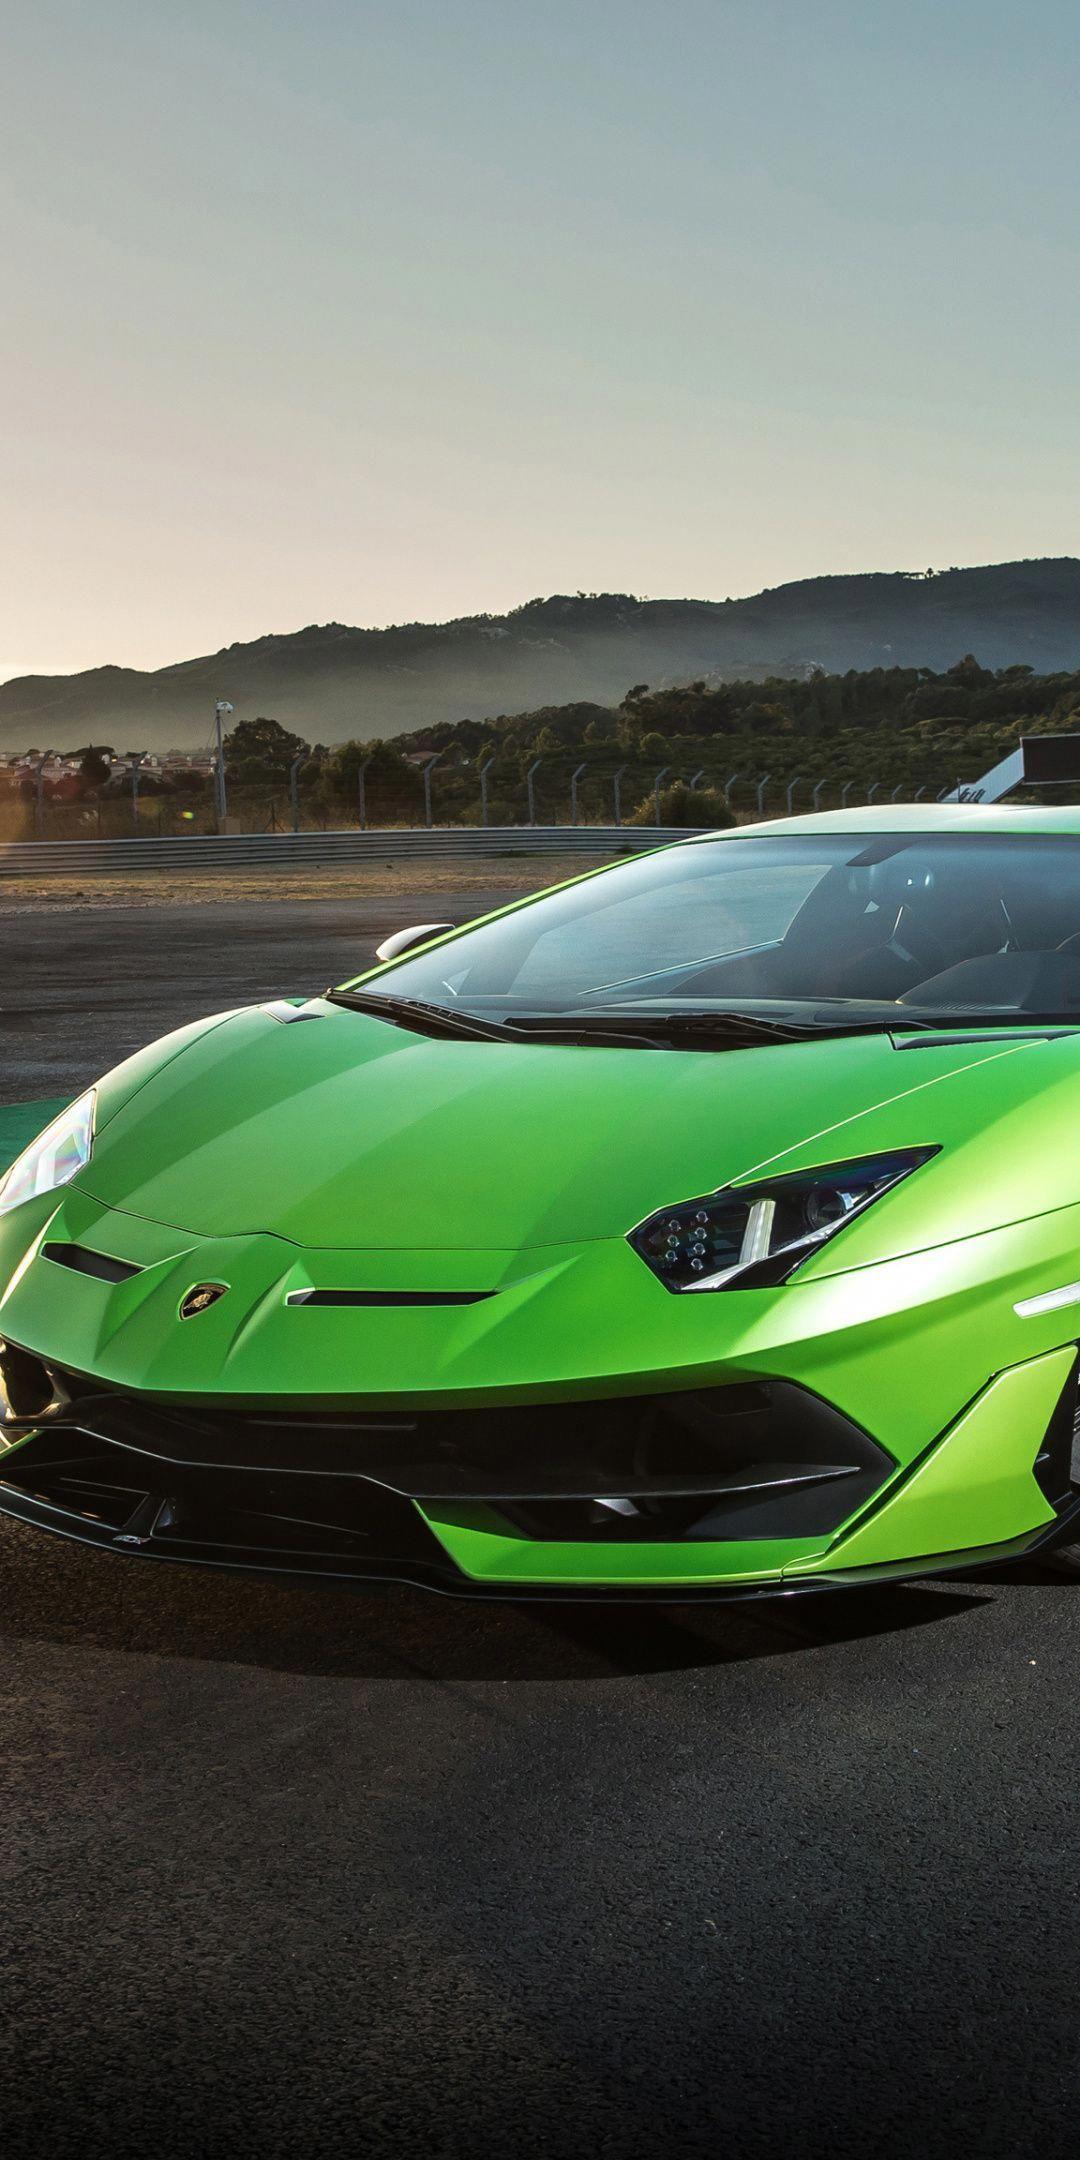 Lamborghini Aventador Svj Green Sports Car 2018 1080x2160 Wallpaper Luxurycars Sports Cars Lamborghini Super Cars Sports Car Wallpaper